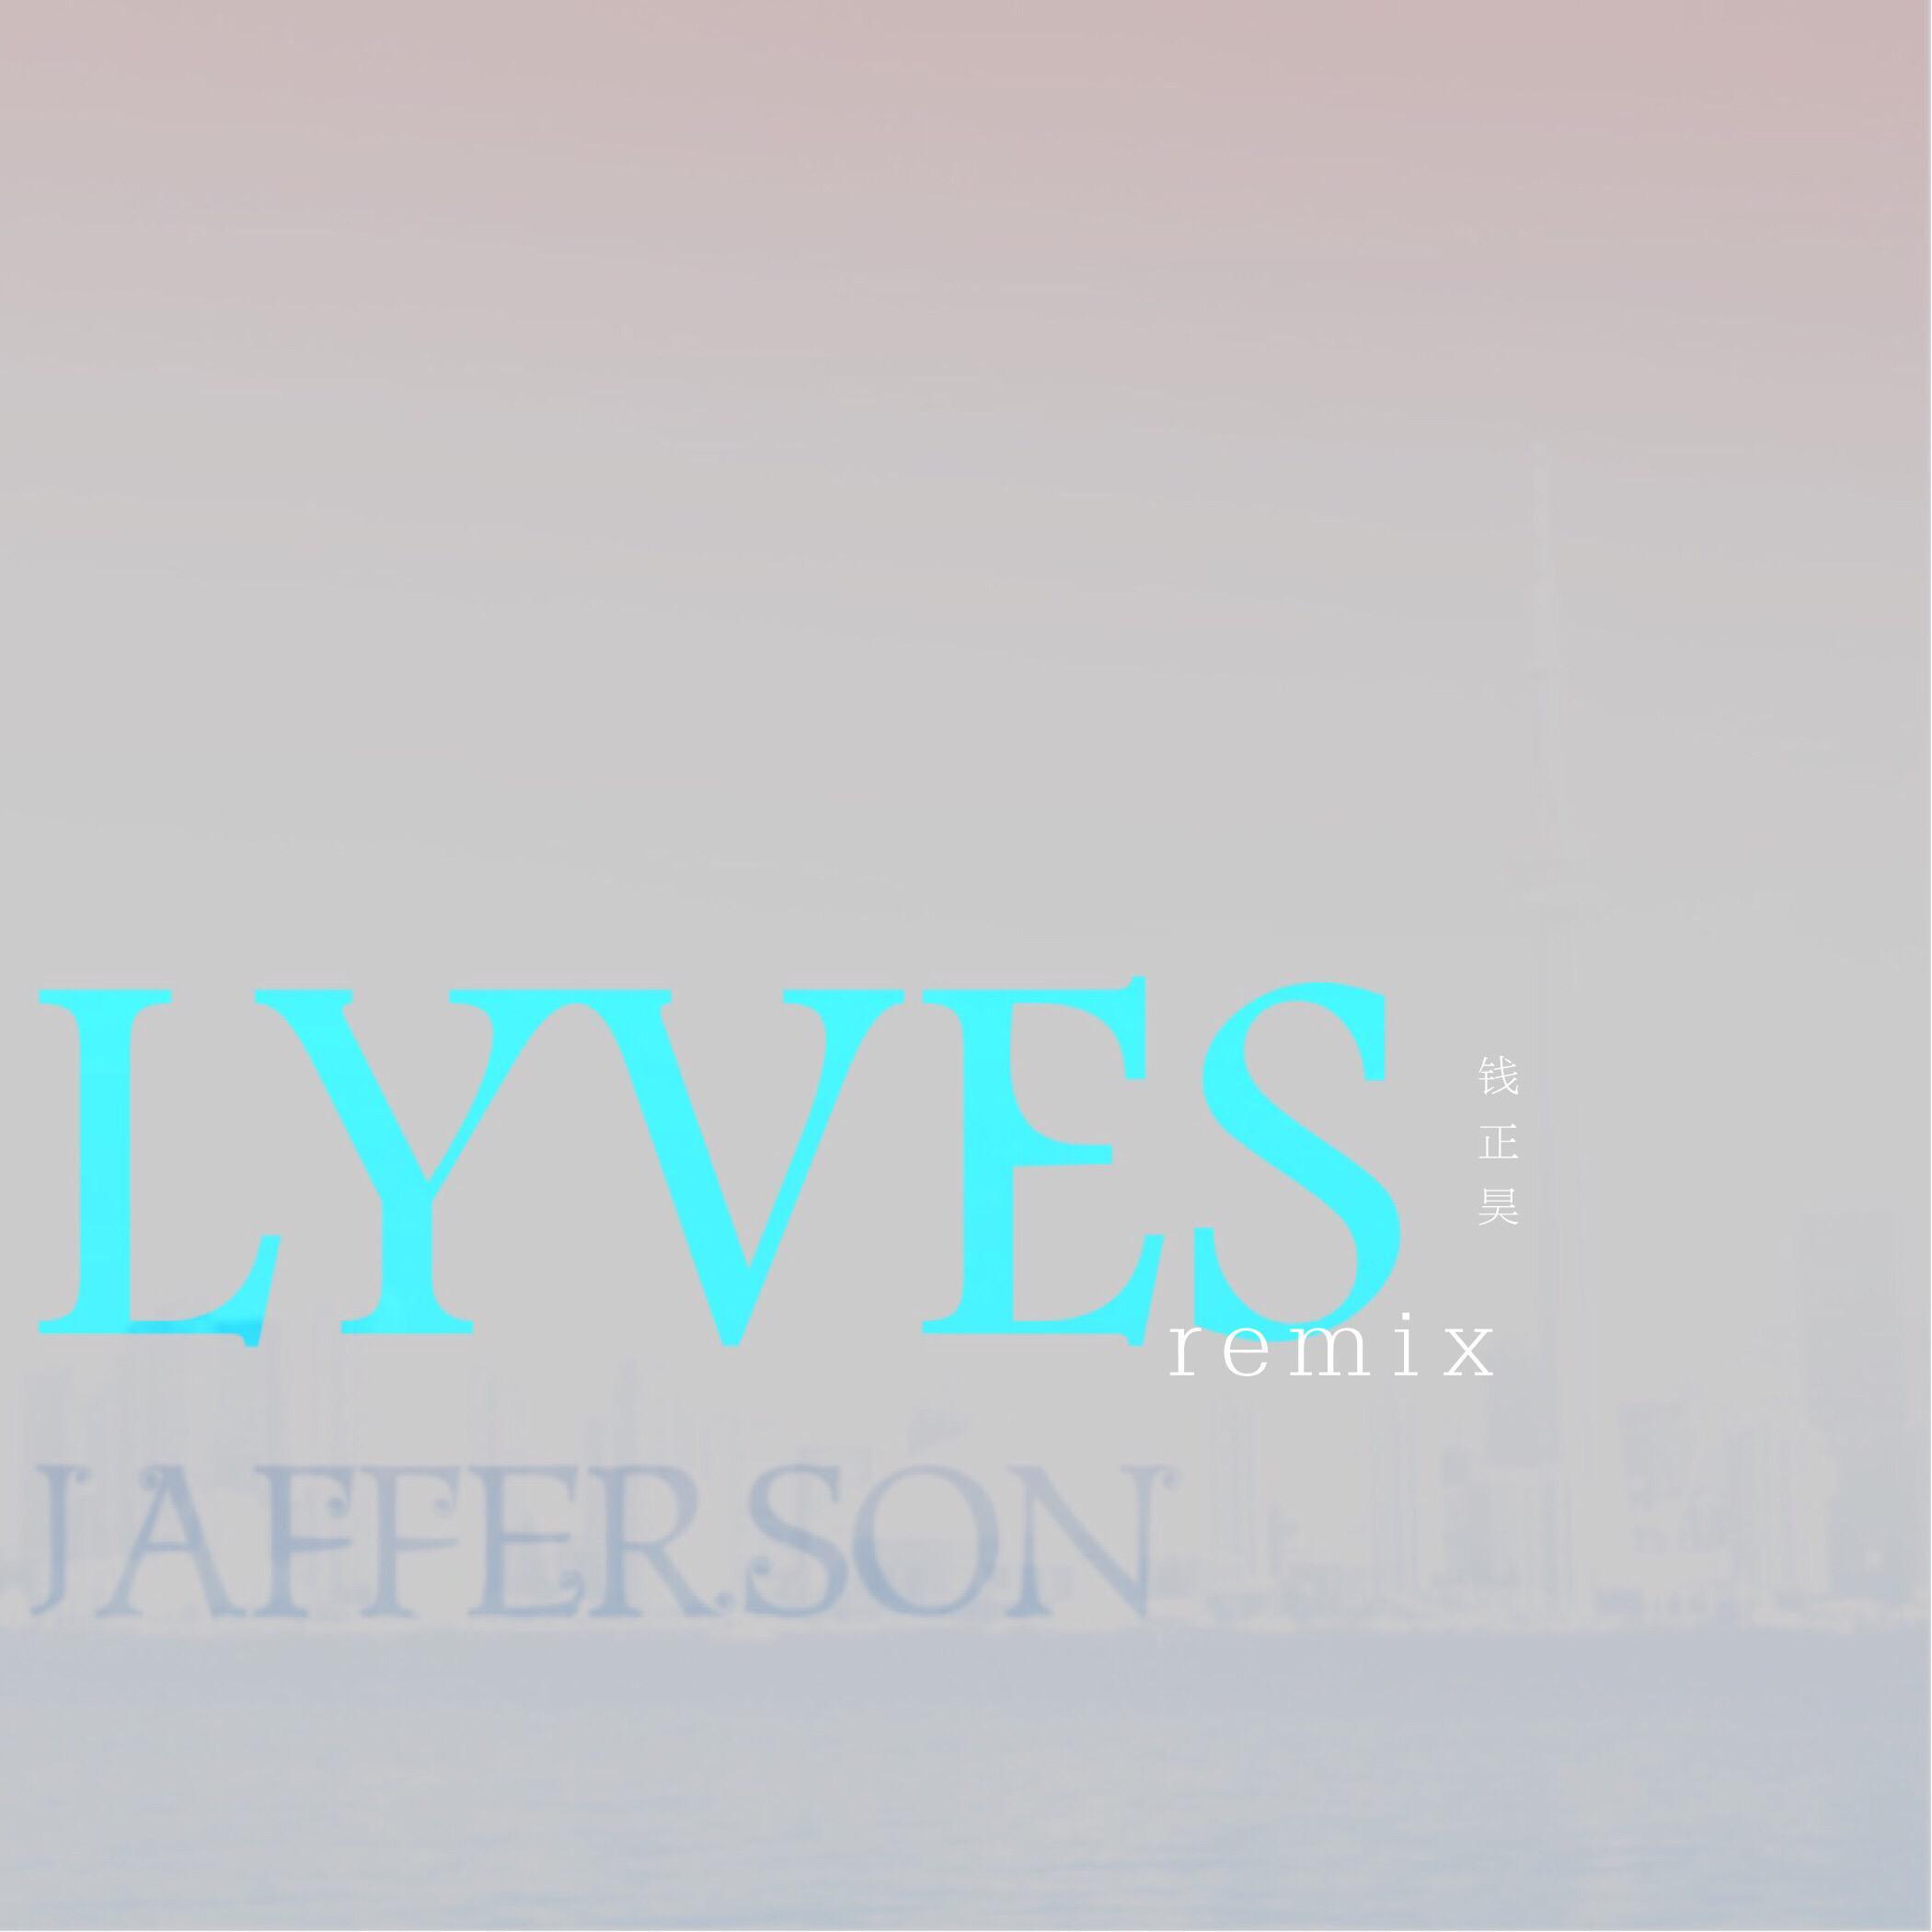 LYVES(remix)